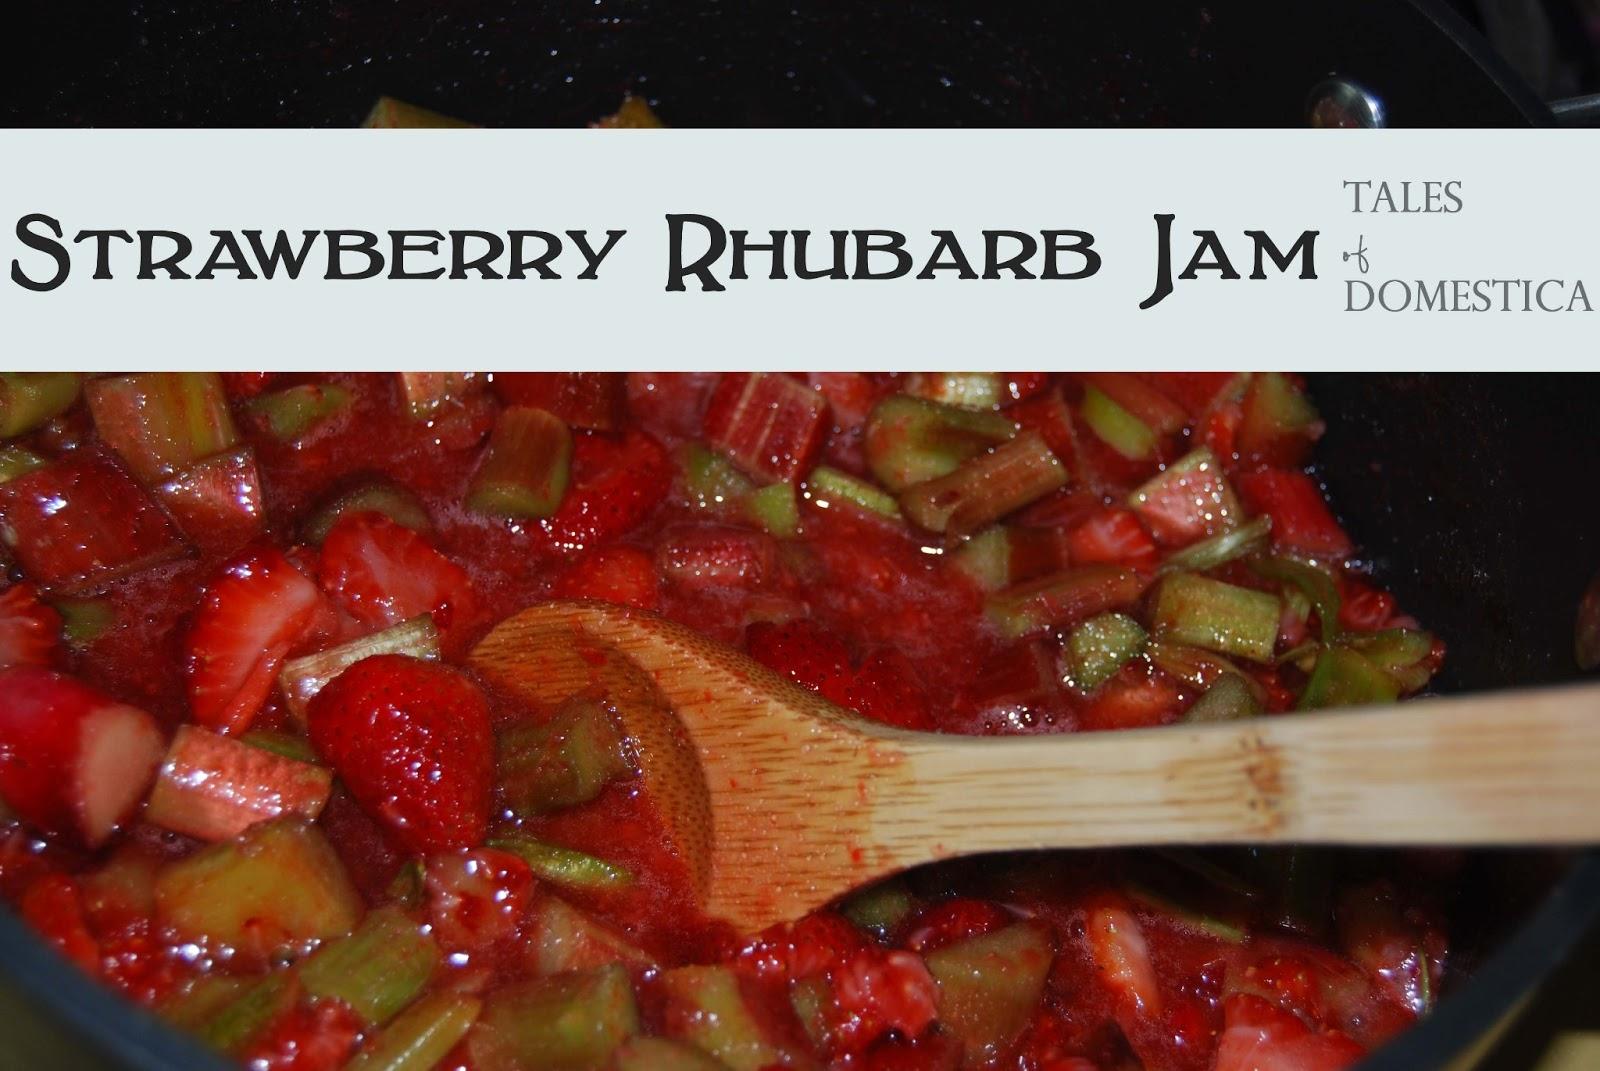 Strawberry Rhubarb Jam - Tales Of Domestica